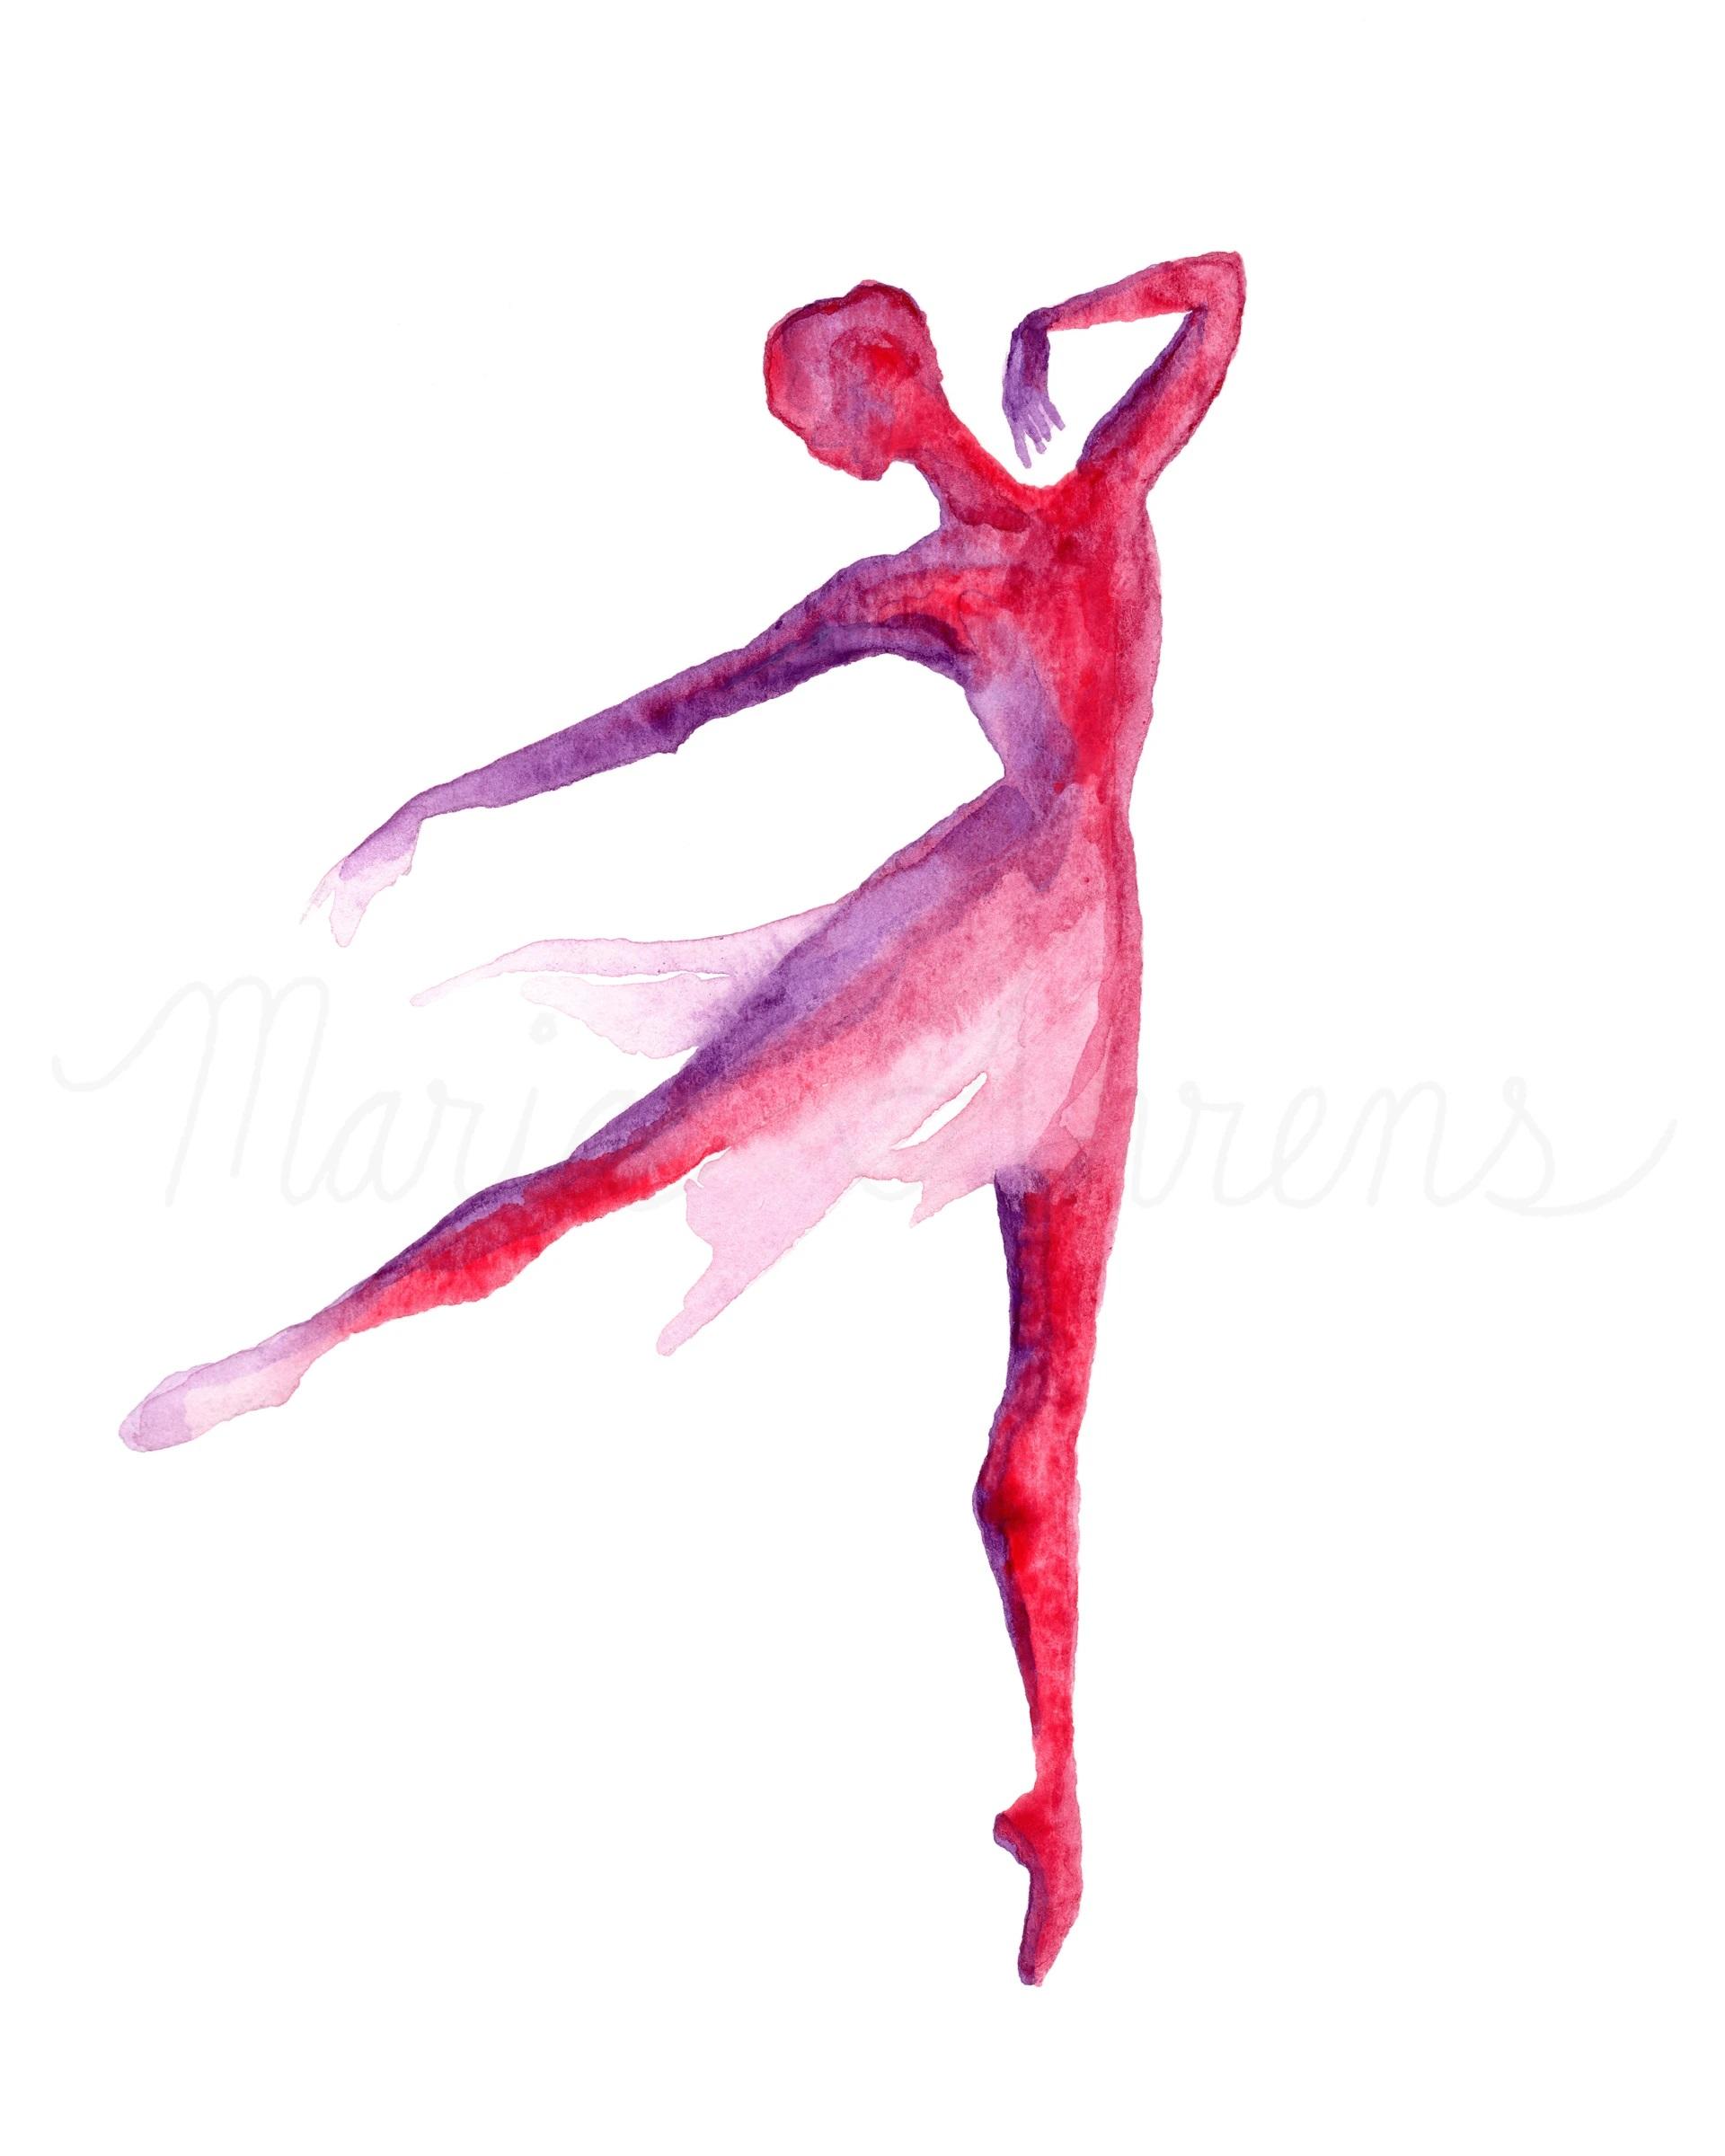 Ballet dancer silhouette composition